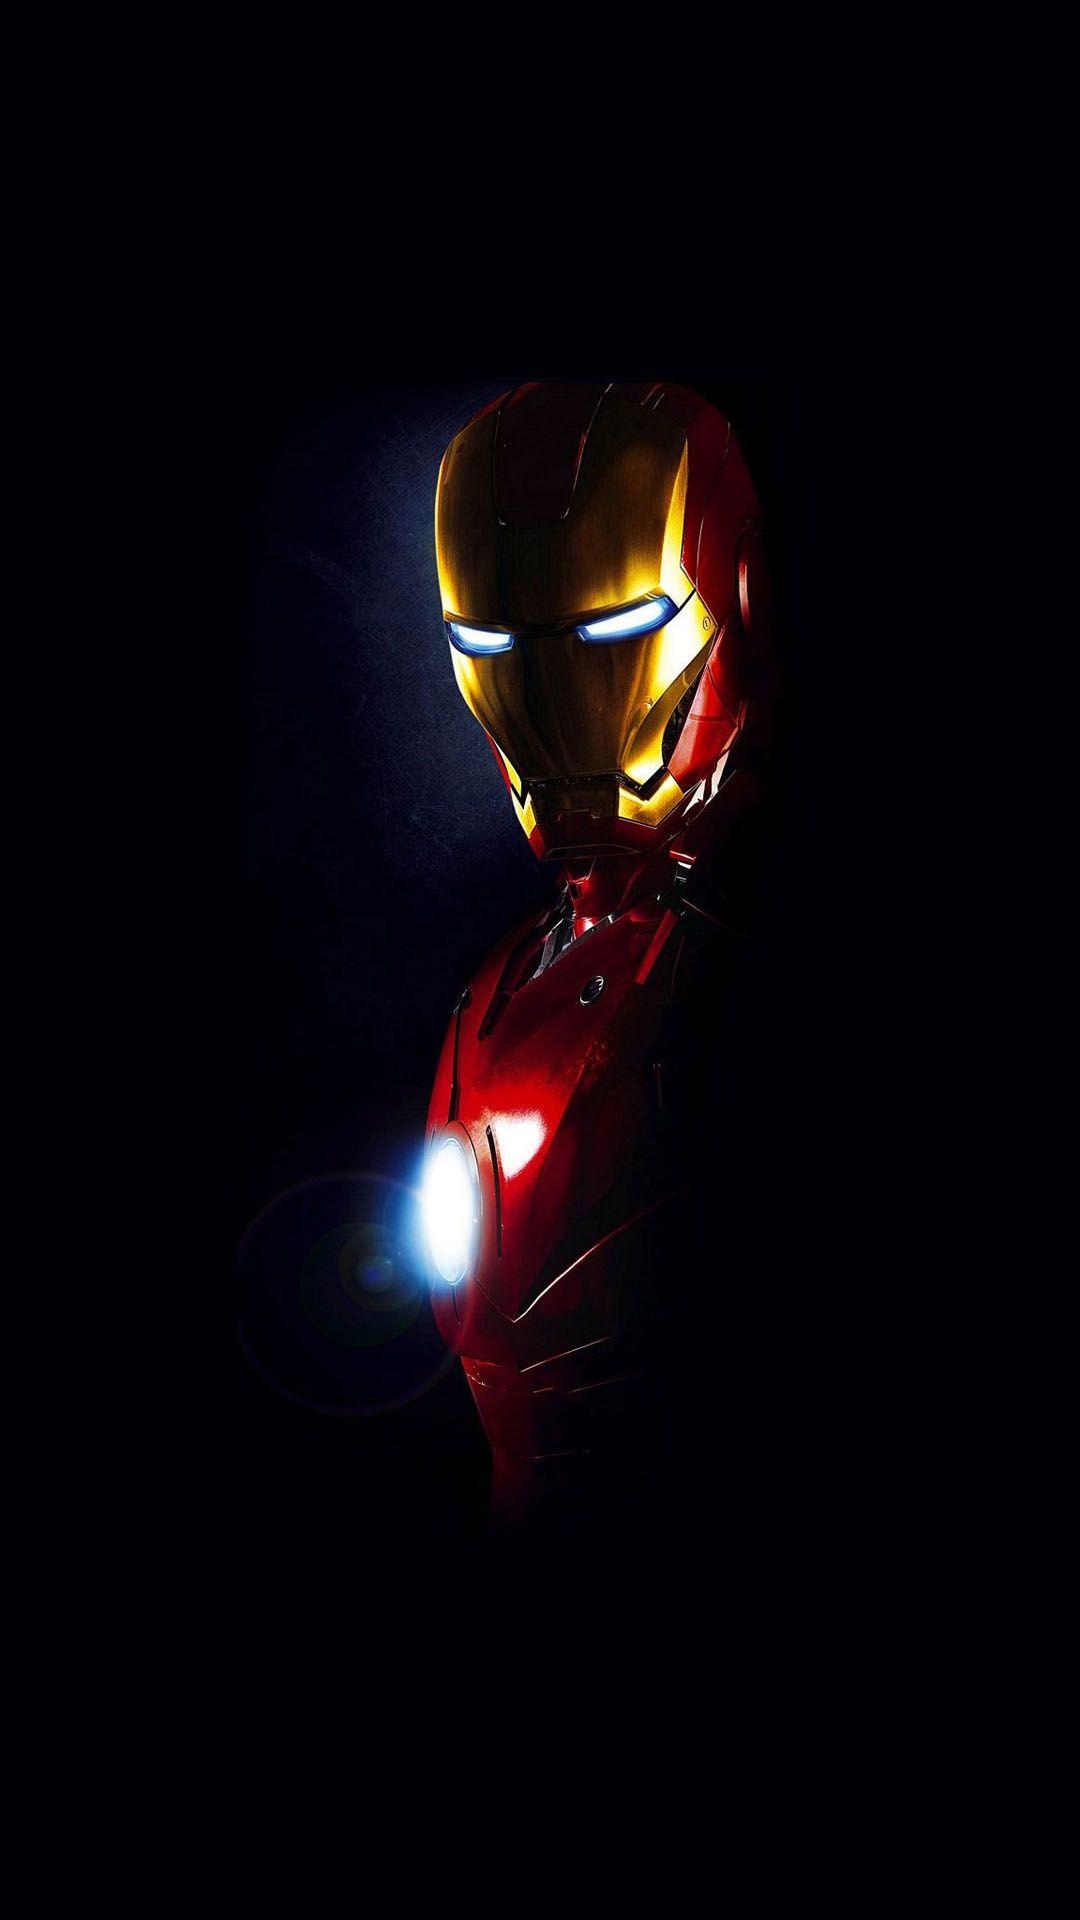 iron man wallpaper for